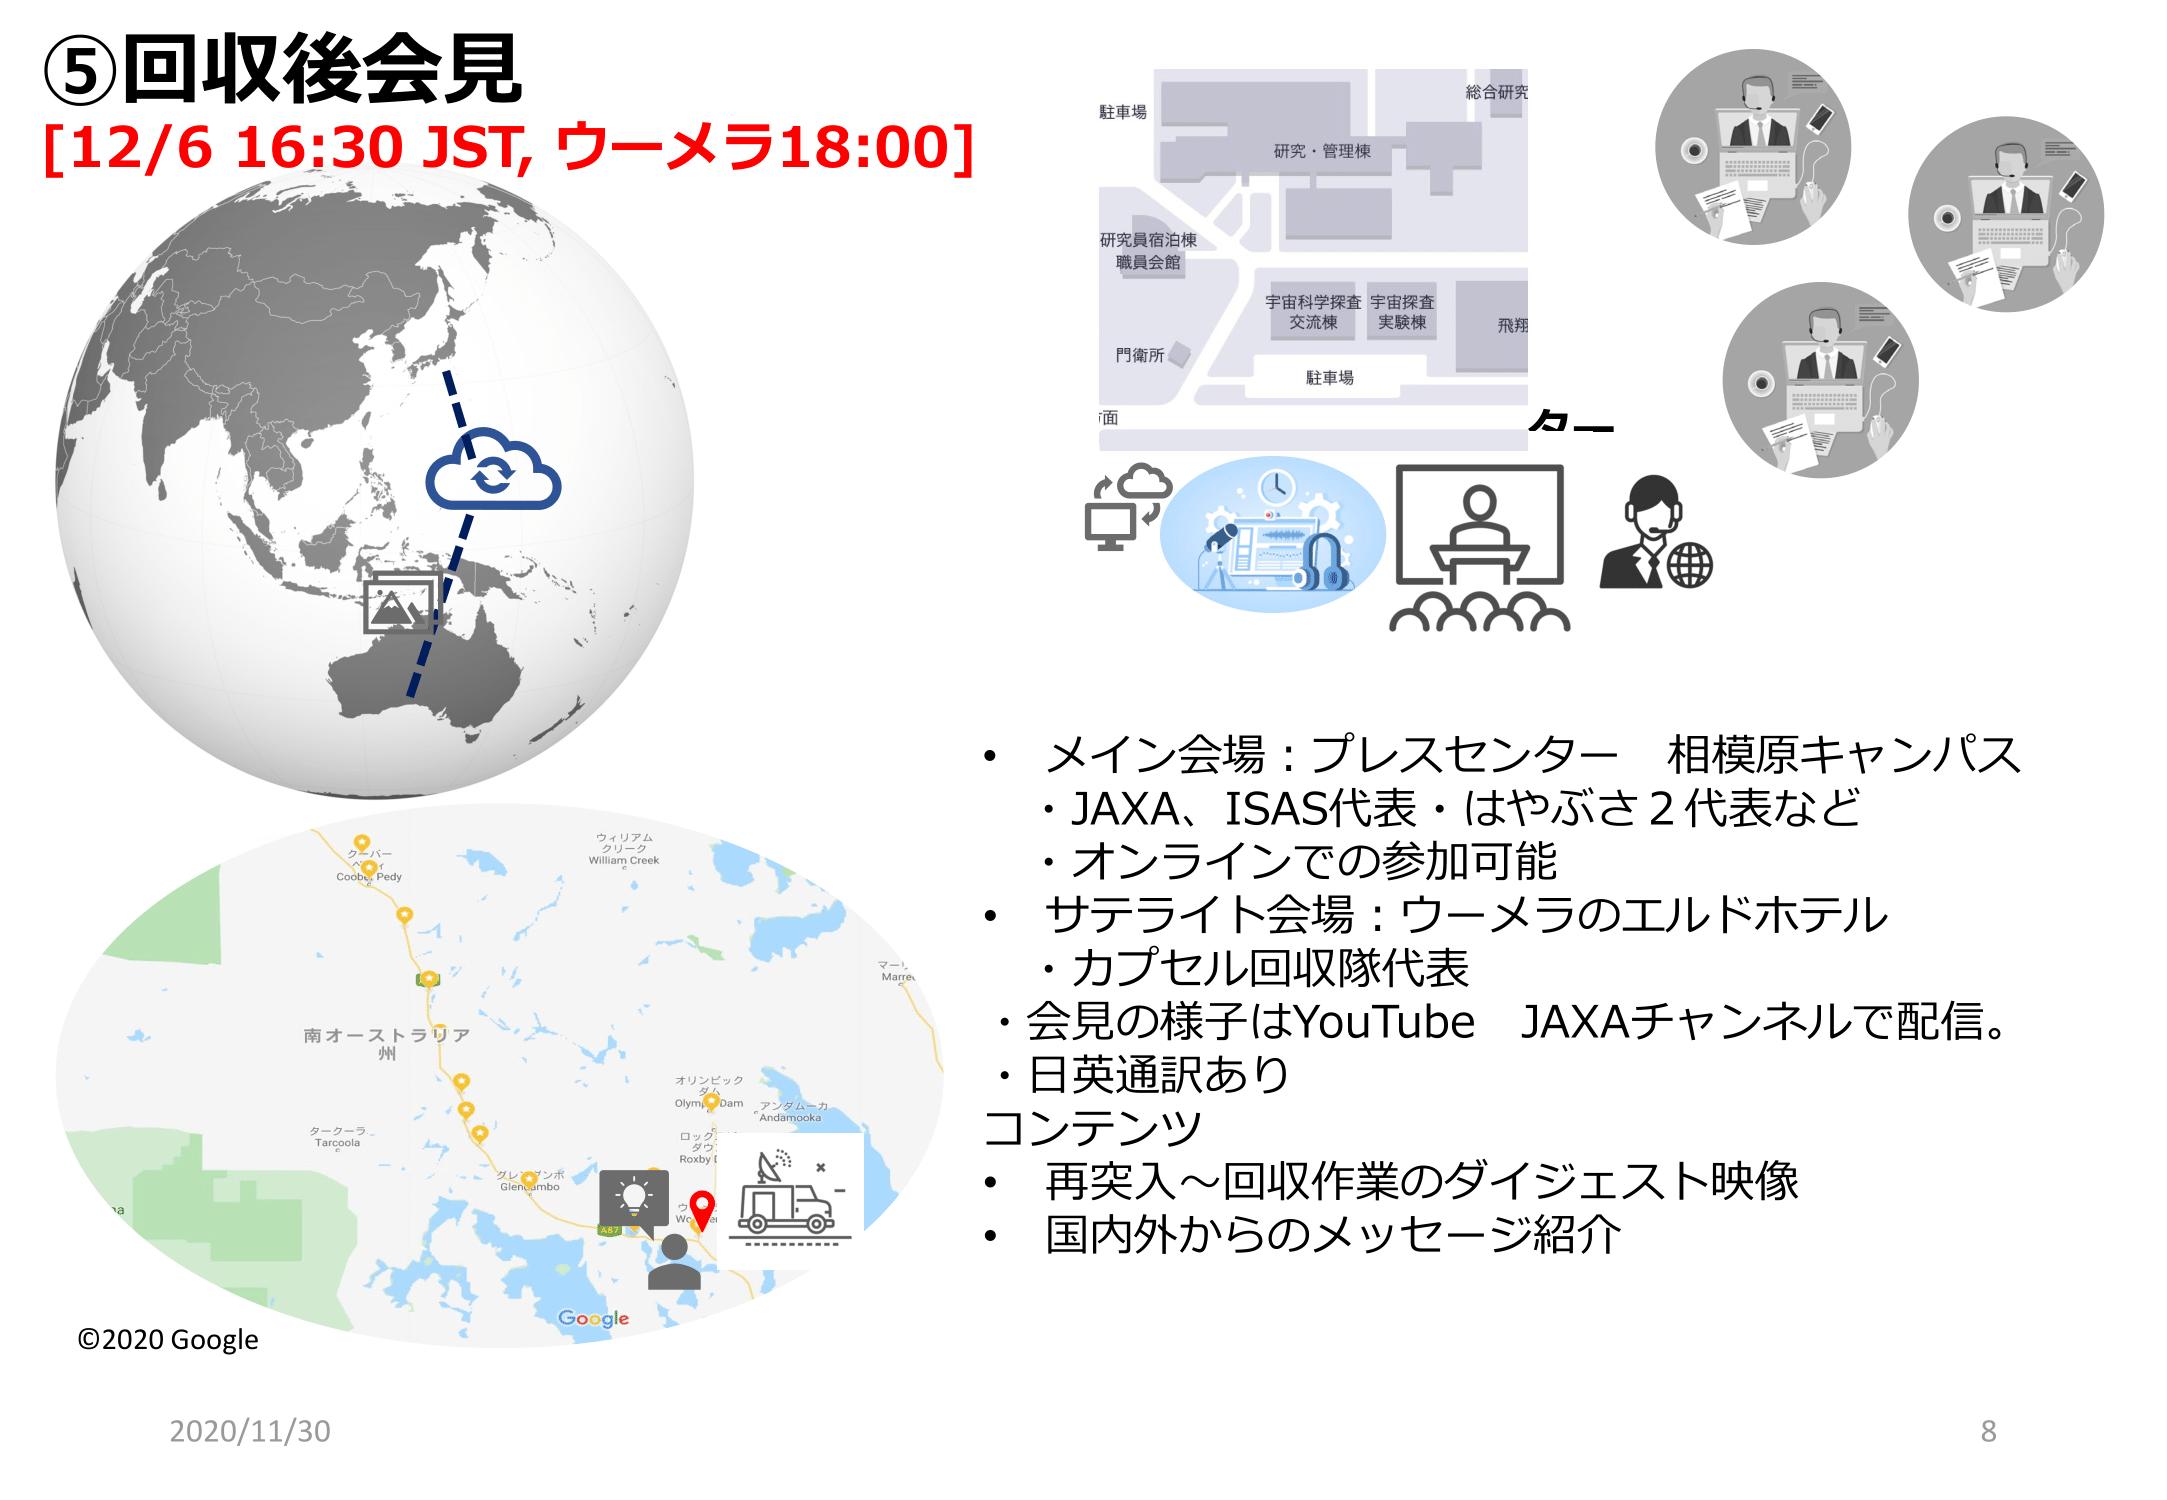 f:id:Imamura:20201130154401p:plain:h250